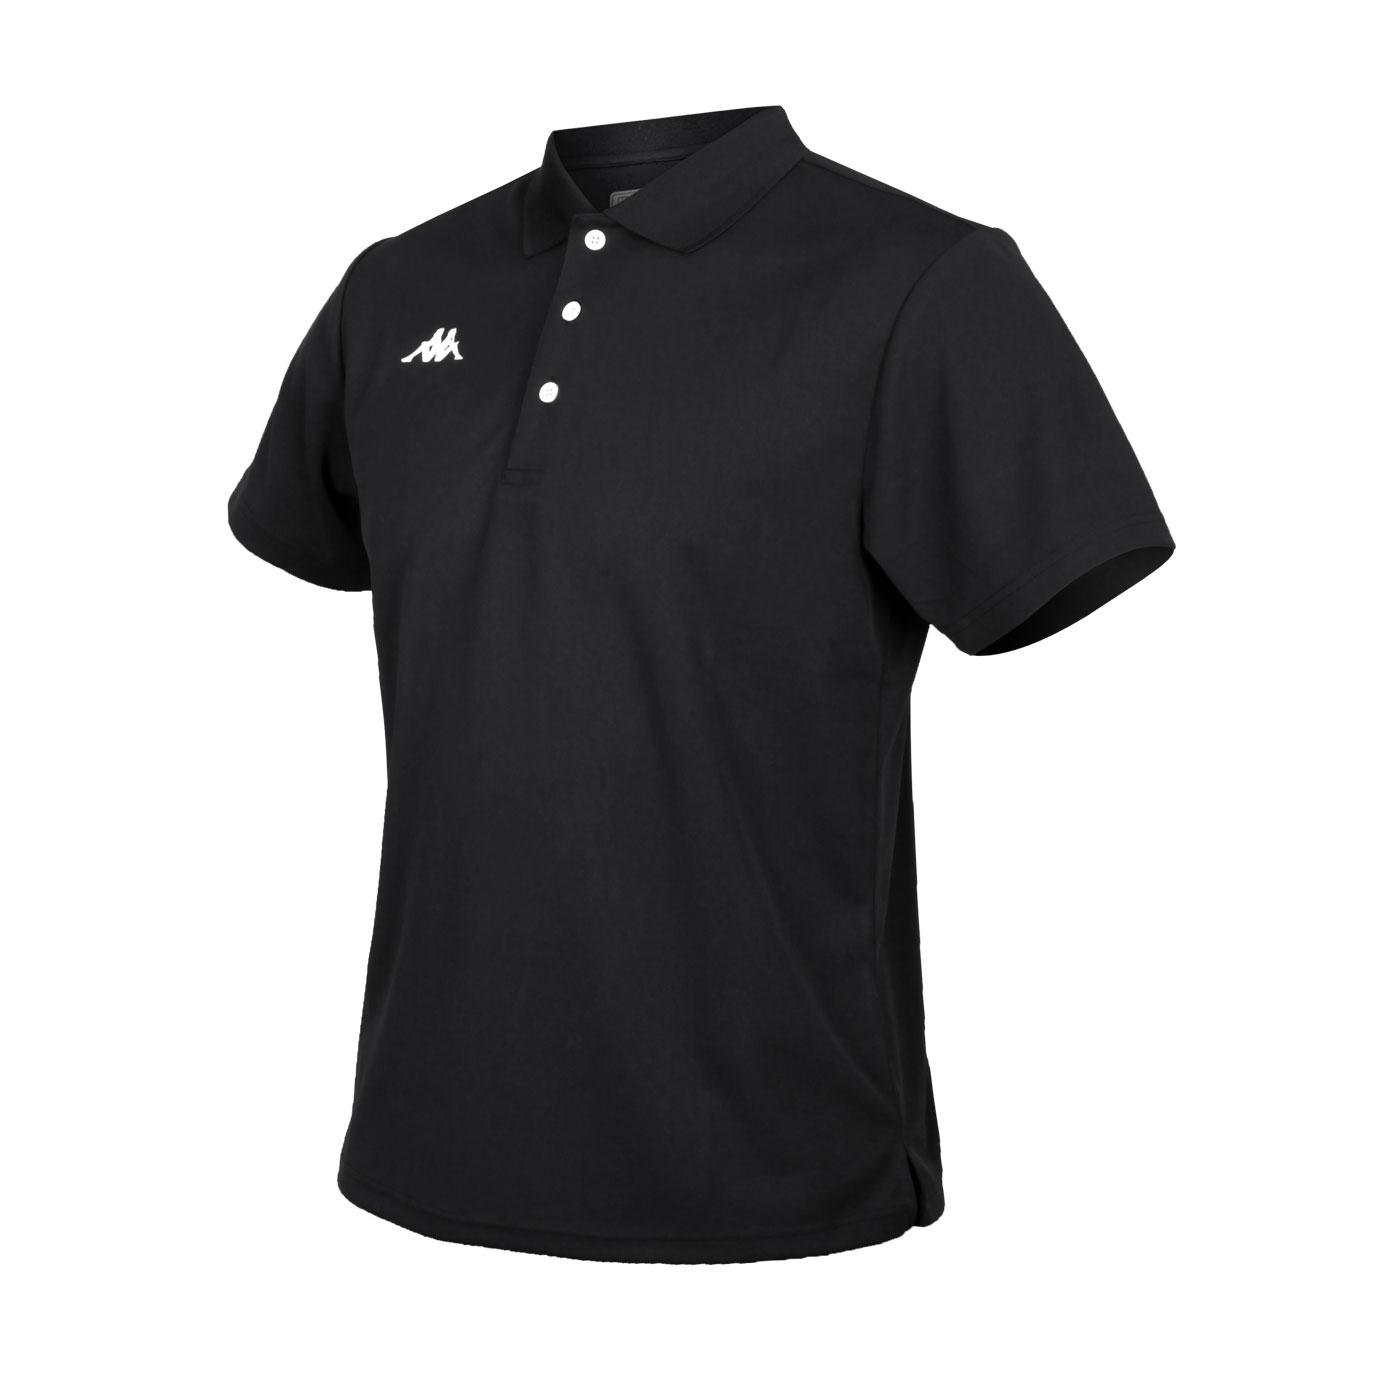 KAPPA 男款K4T短袖POLO衫 321762W-005